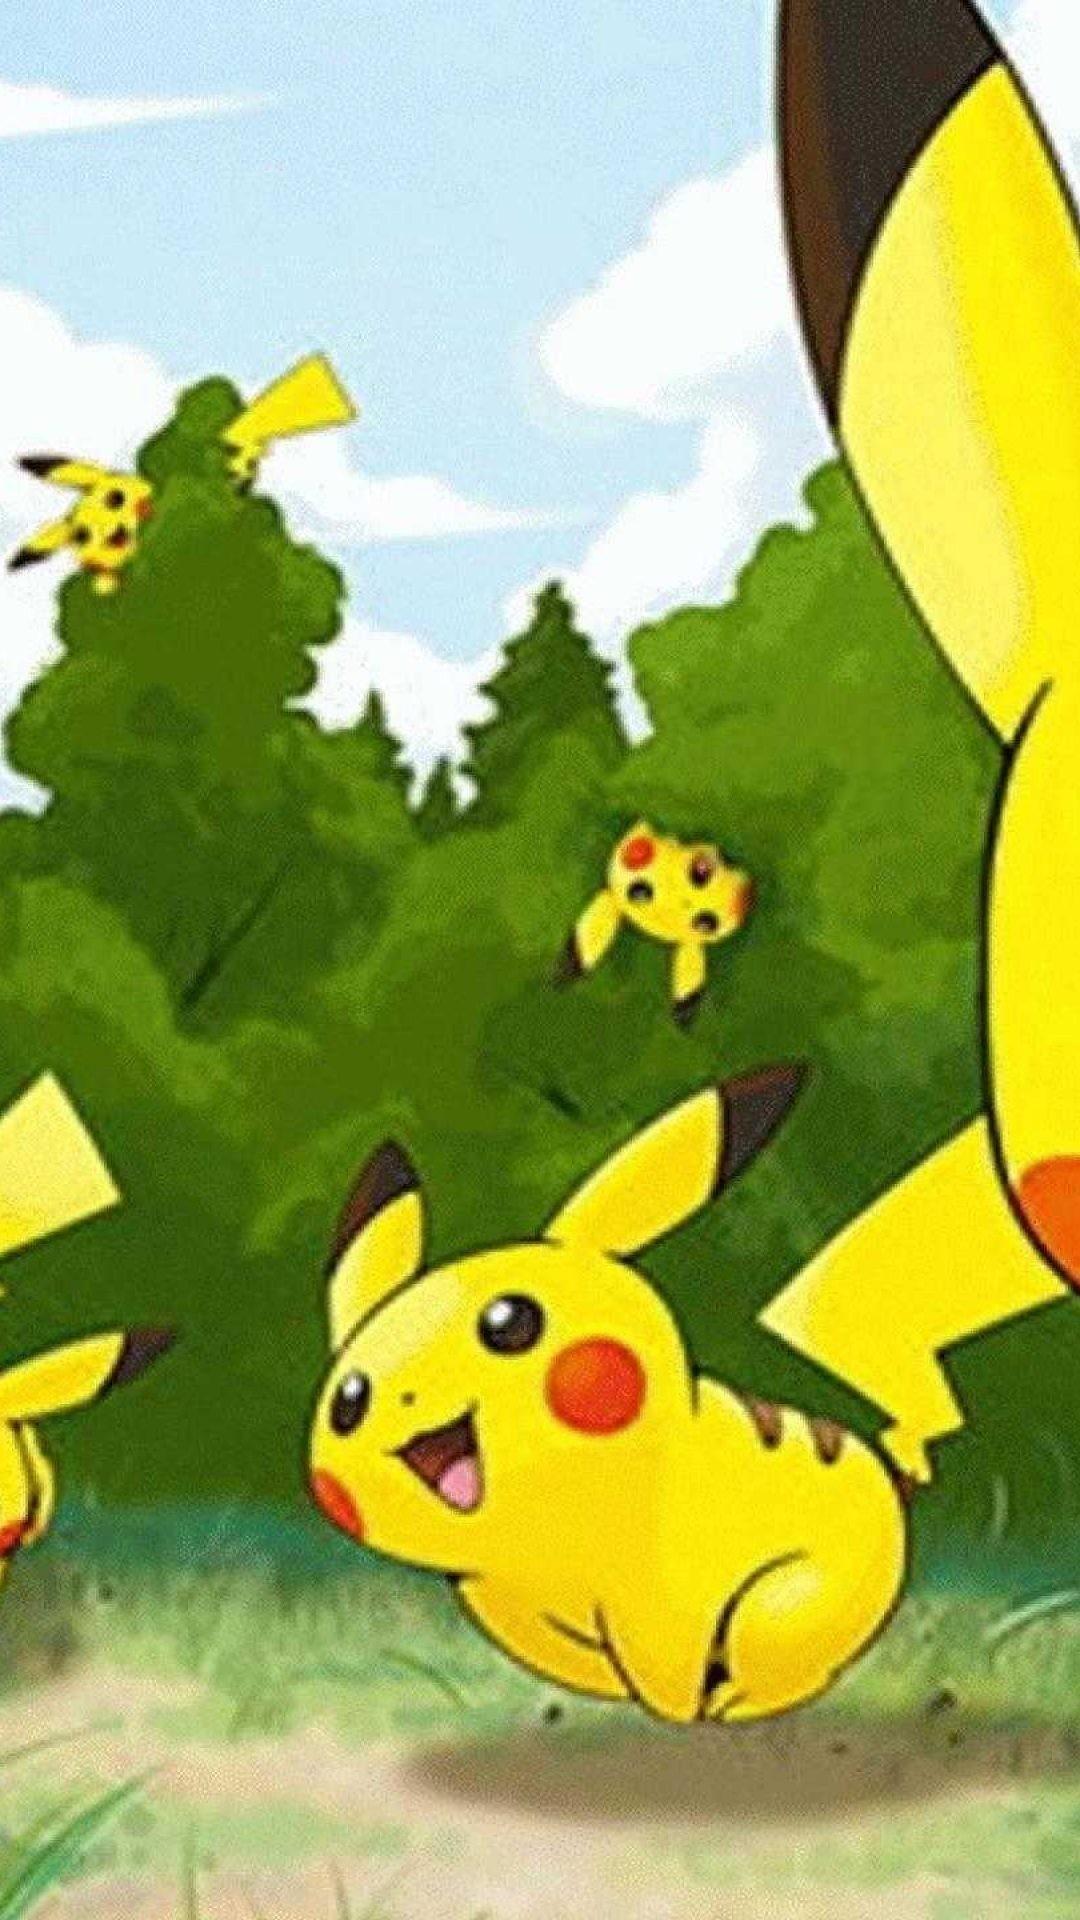 pikachu hd wallpapers free download